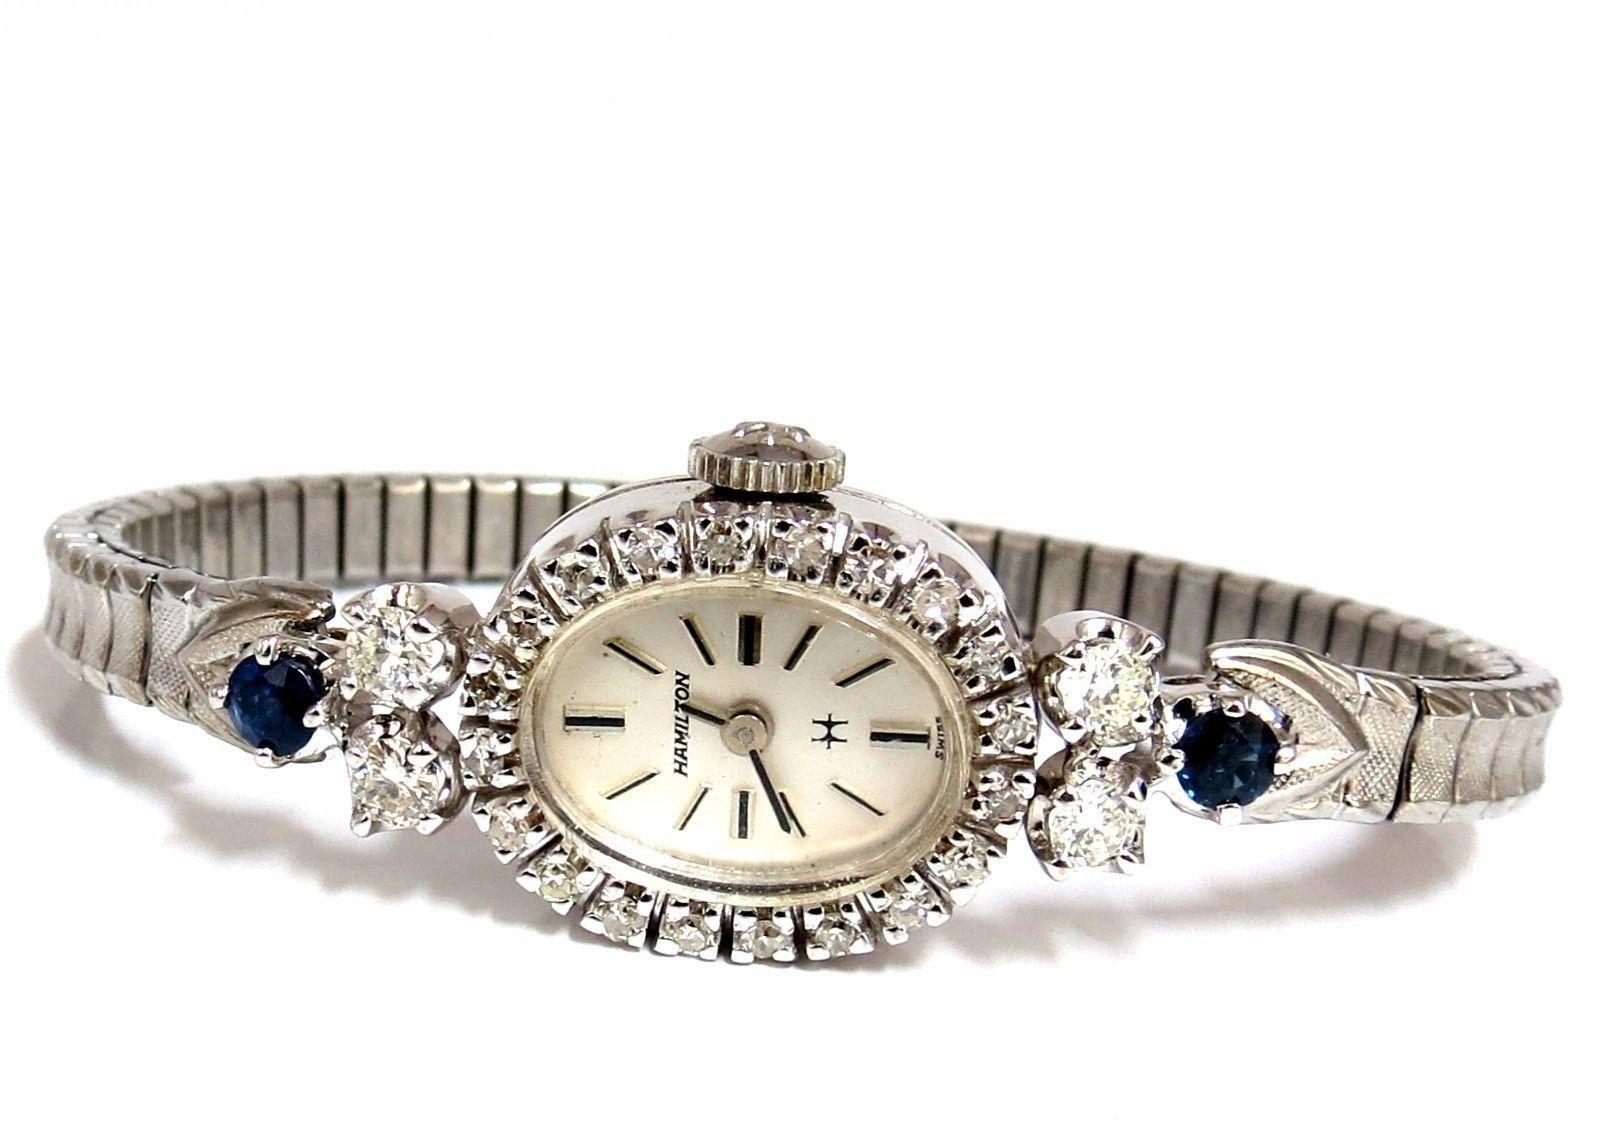 Hamilton Ladies watch 1.40ct. sapphire diamonds 14kt.